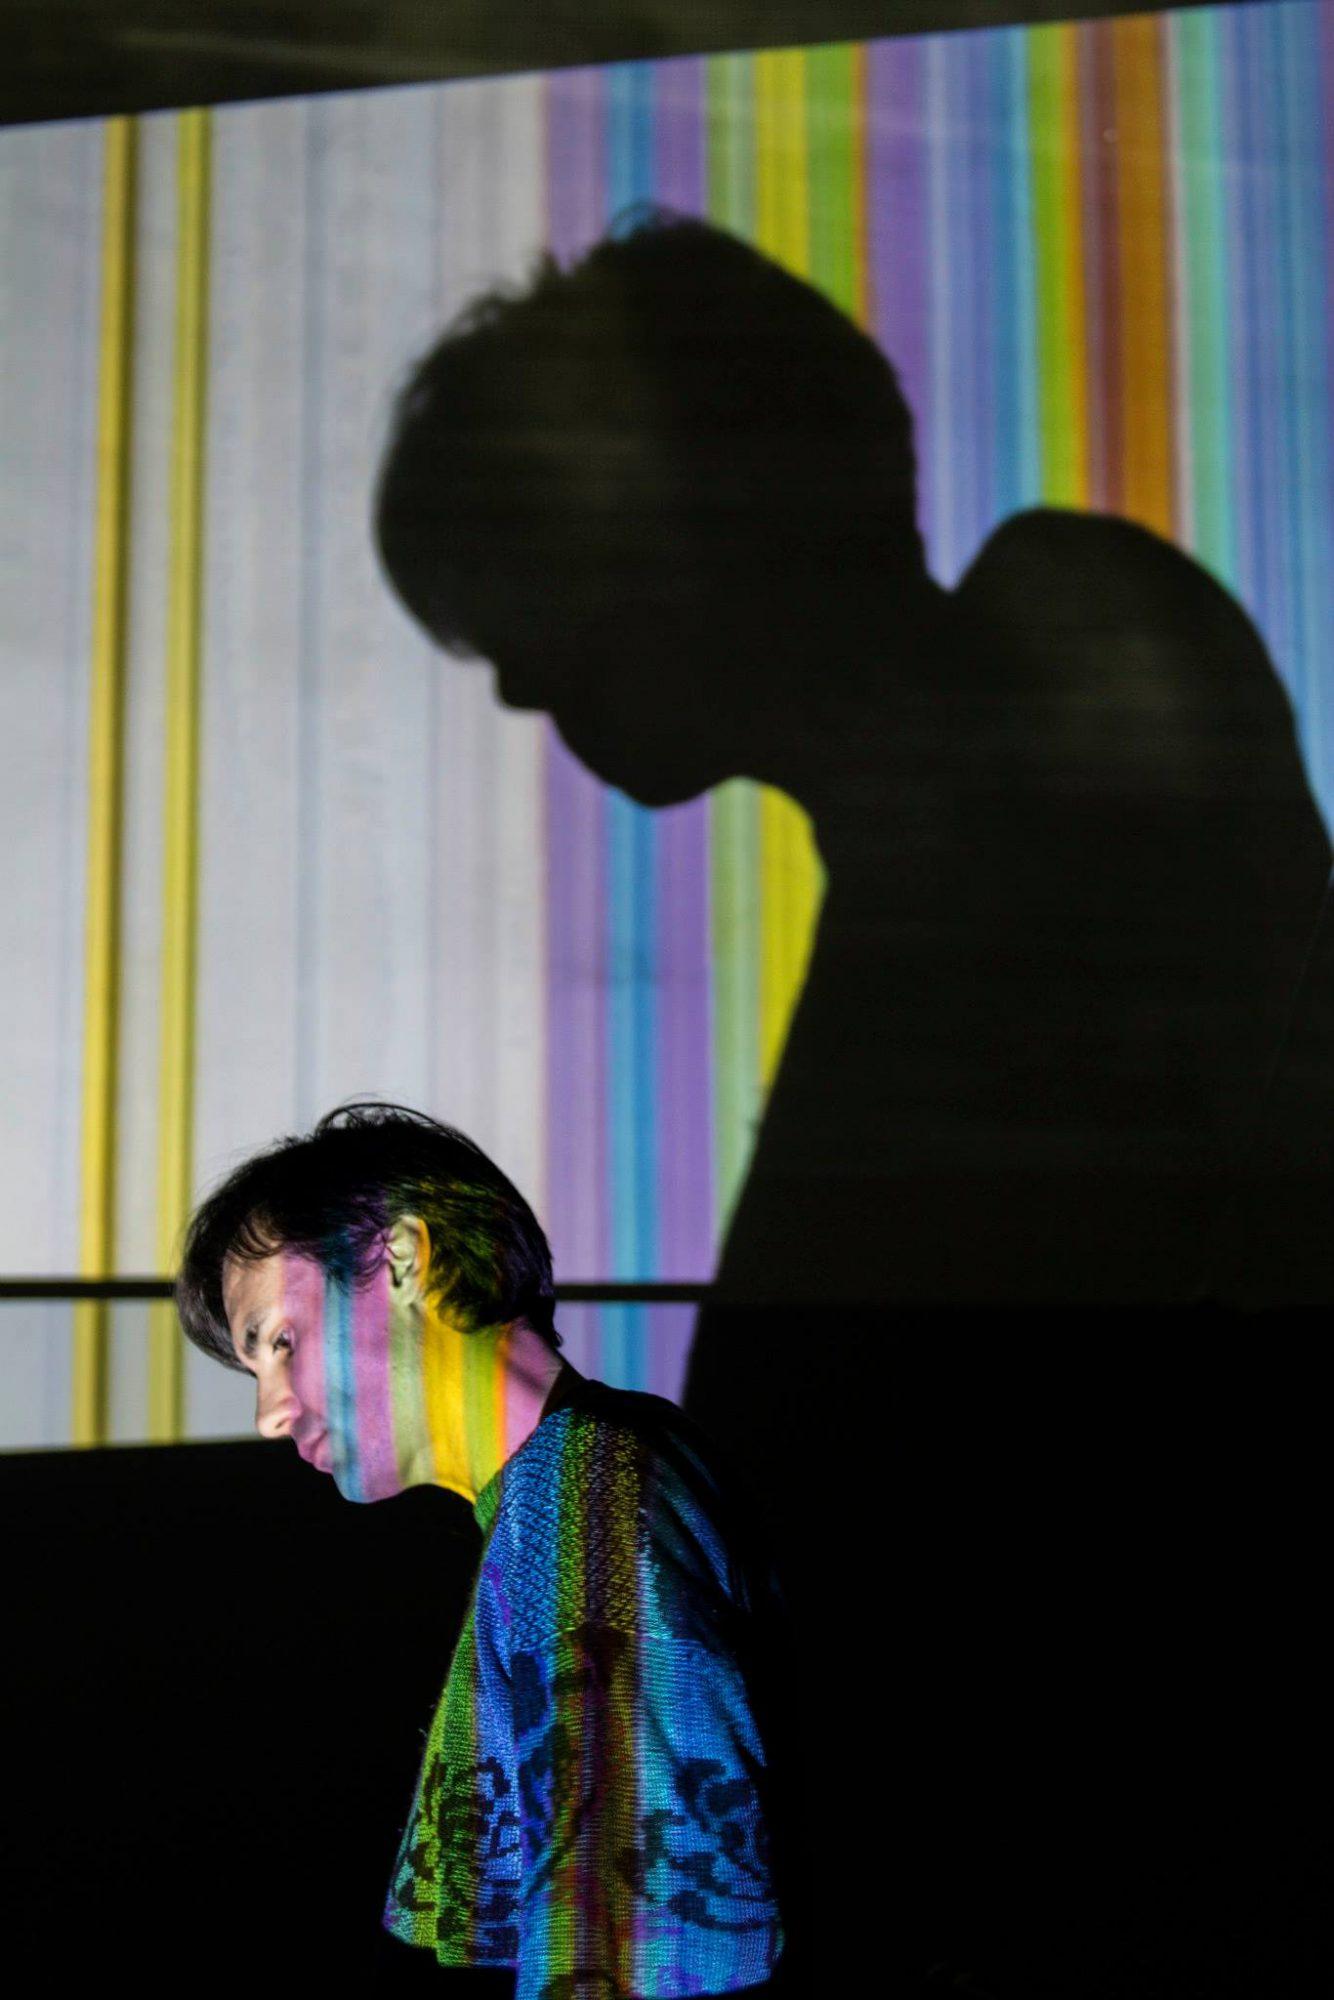 Ememe Amogano + Julia Hanadi Al Abed + Scott Sinclair (trio) – Arles, France – 2014